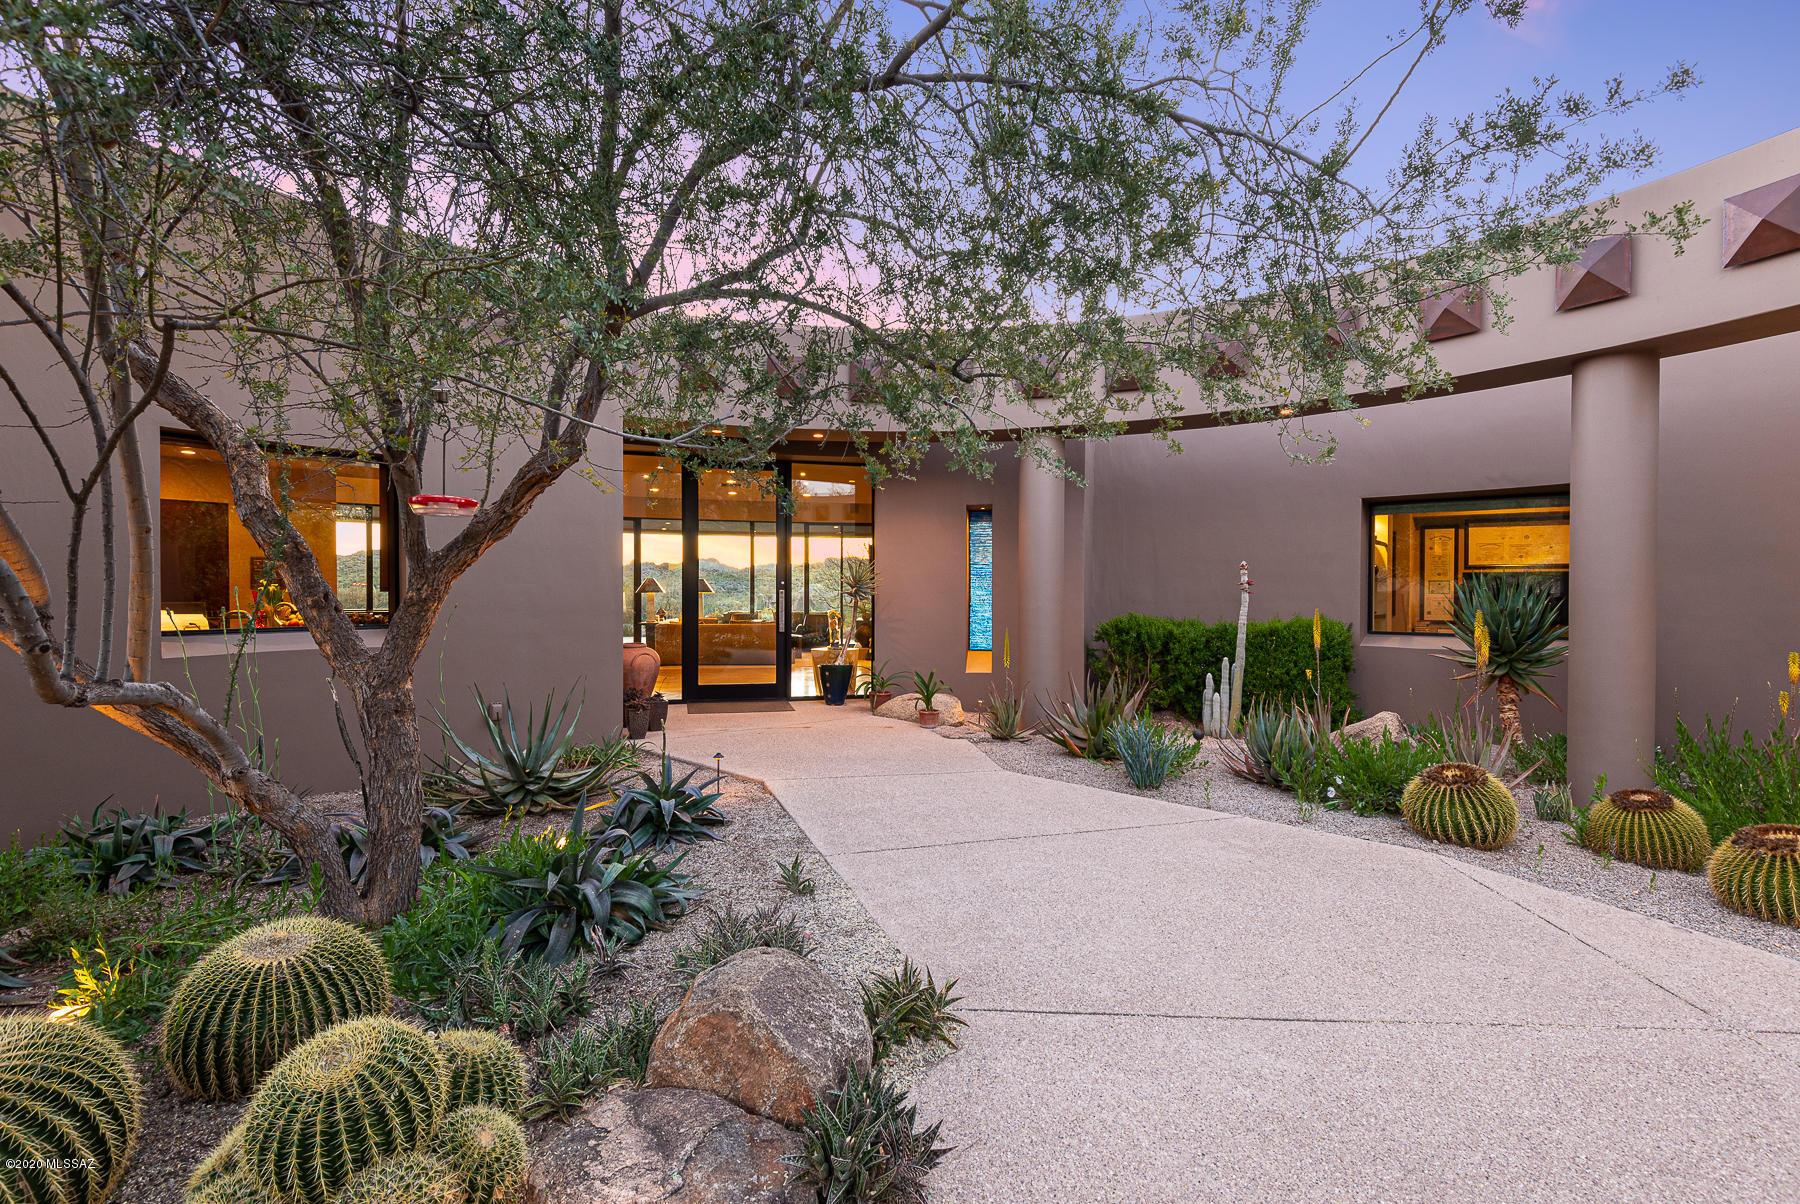 Photo of 525 E Crescent Moon Drive, Oro Valley, AZ 85755